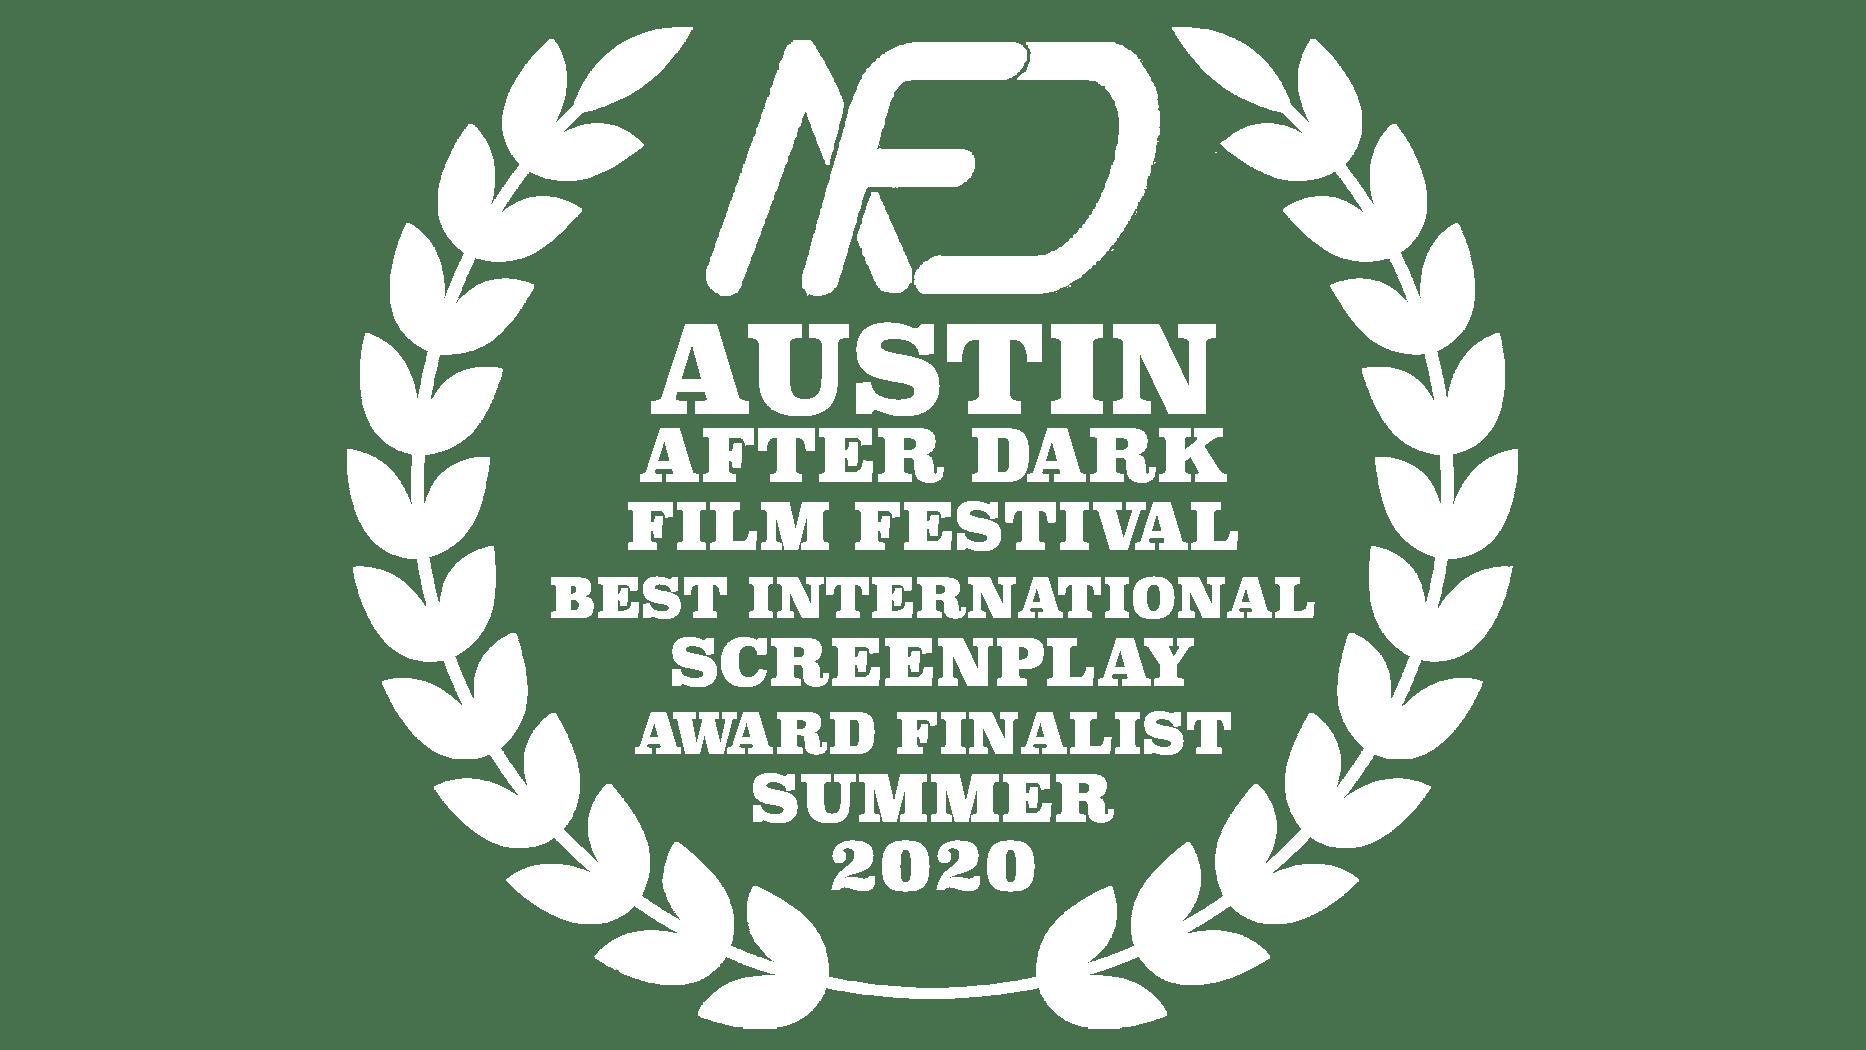 Best International Screenplay Finalist Austin After Dark Film Festival Summer 2020